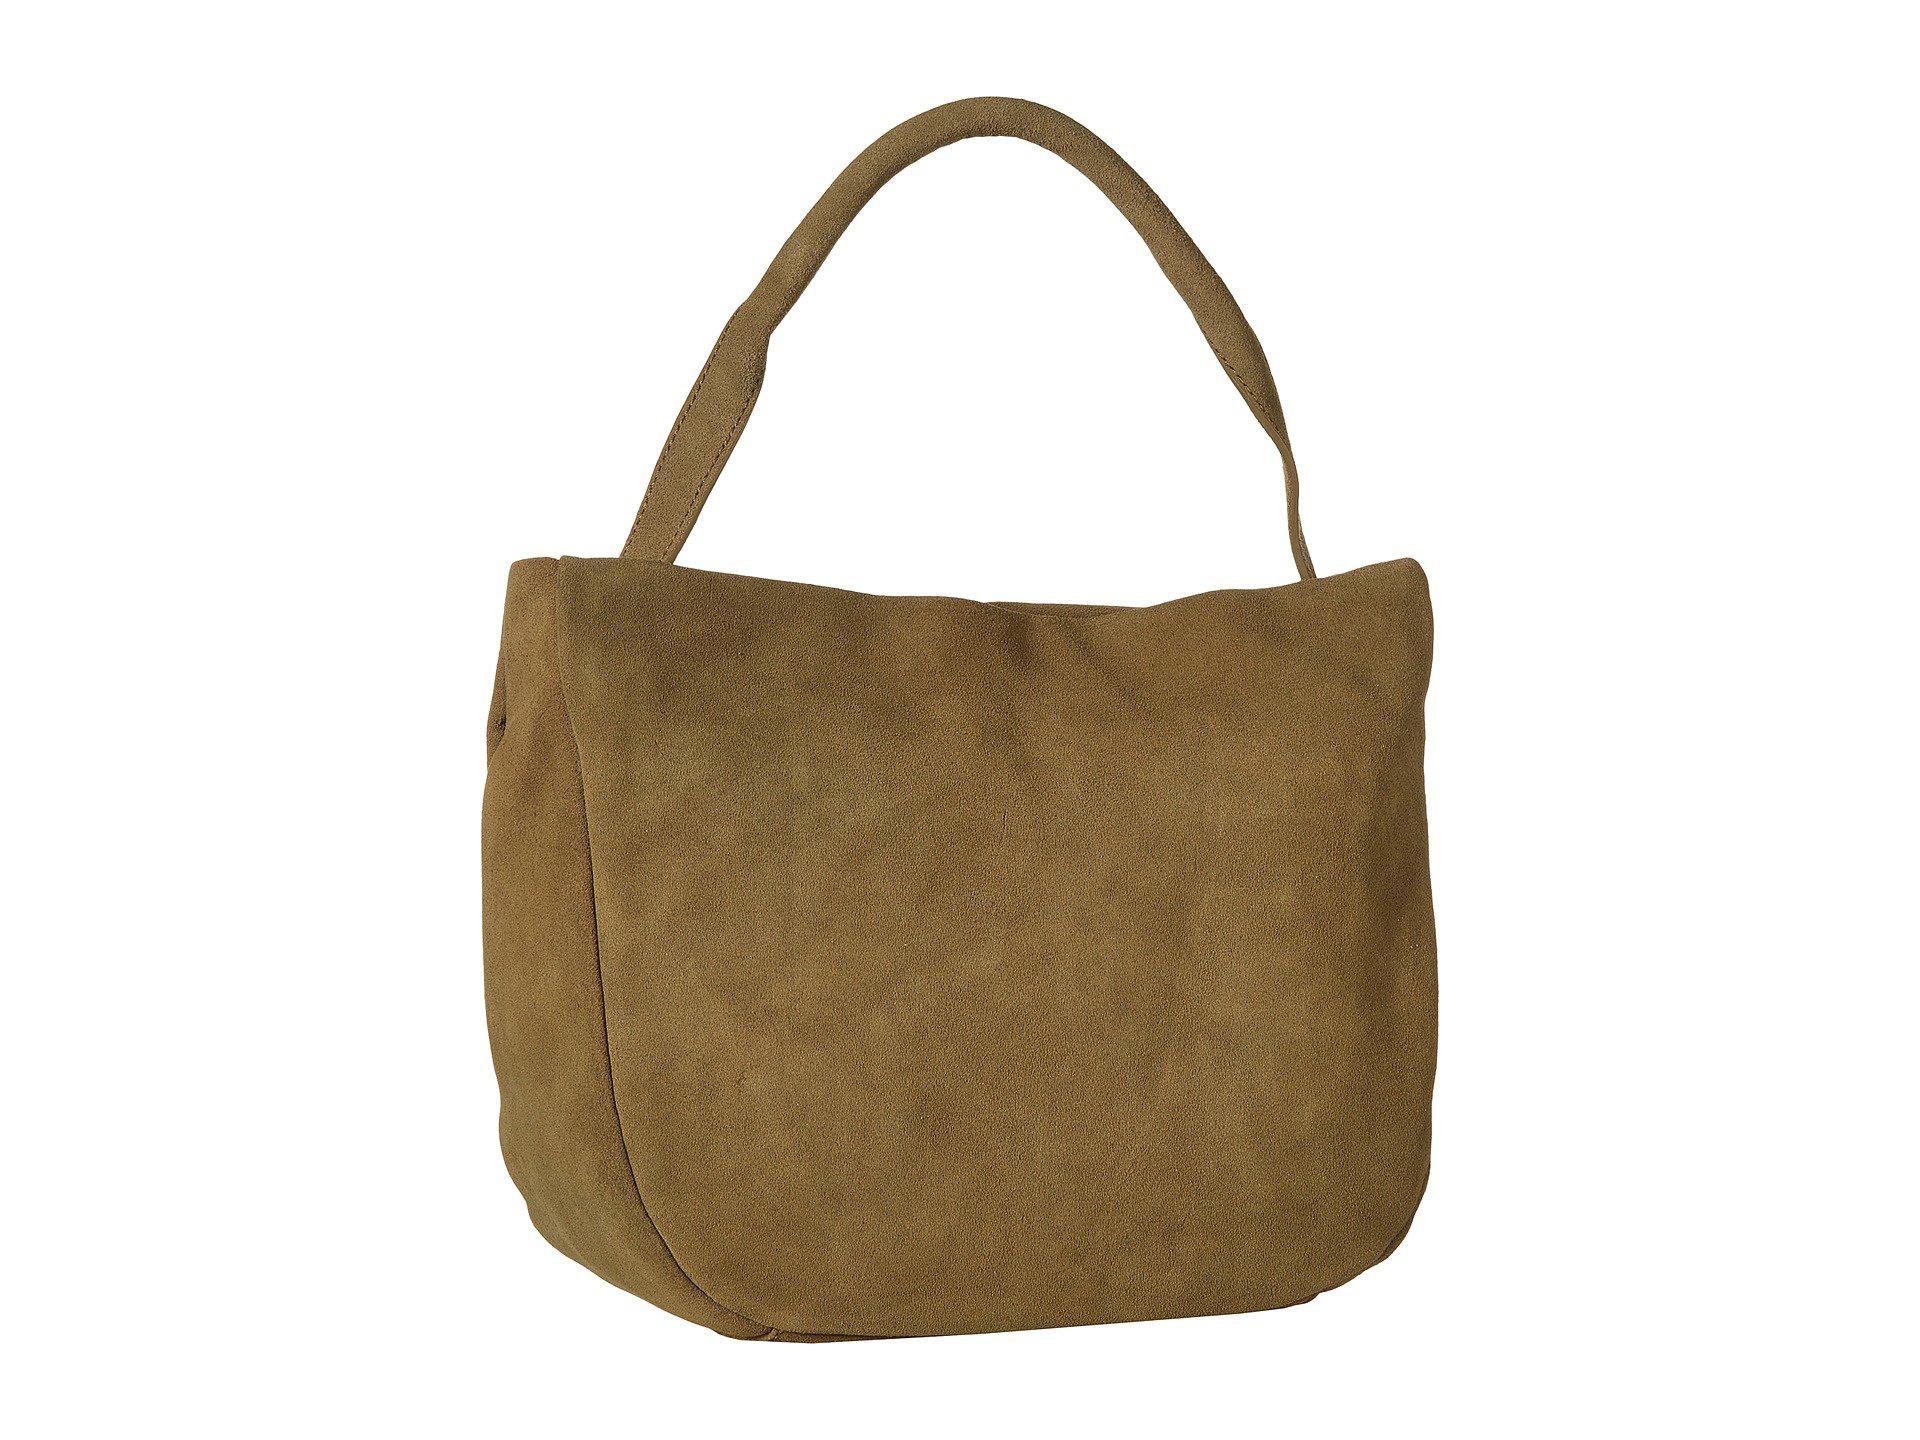 The Sak - Multicolor The 120 Small Hobo By Collective (black) Hobo Handbags  -. View fullscreen 762d750ff1a9d